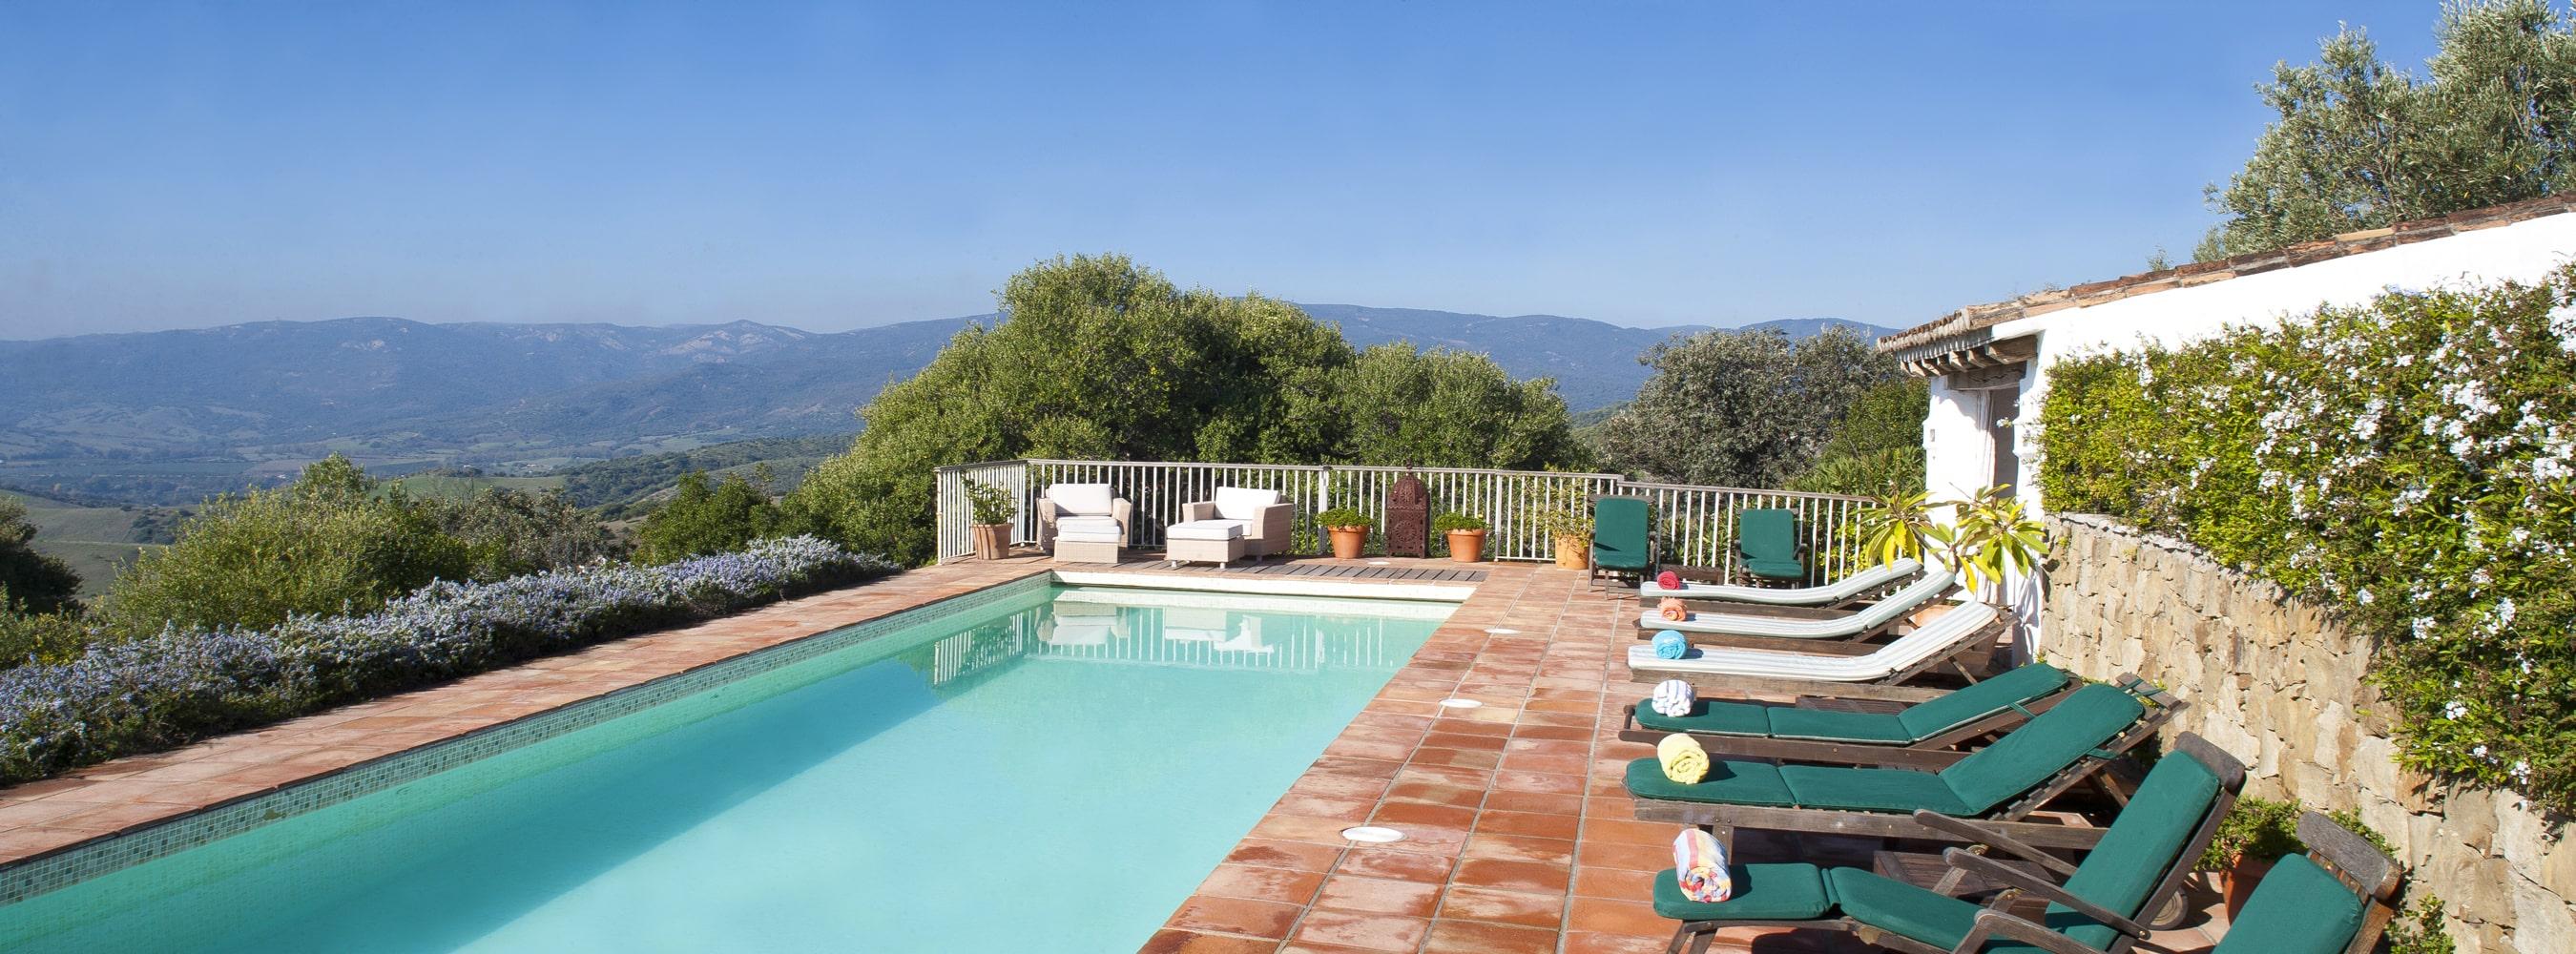 pool and view gaucin